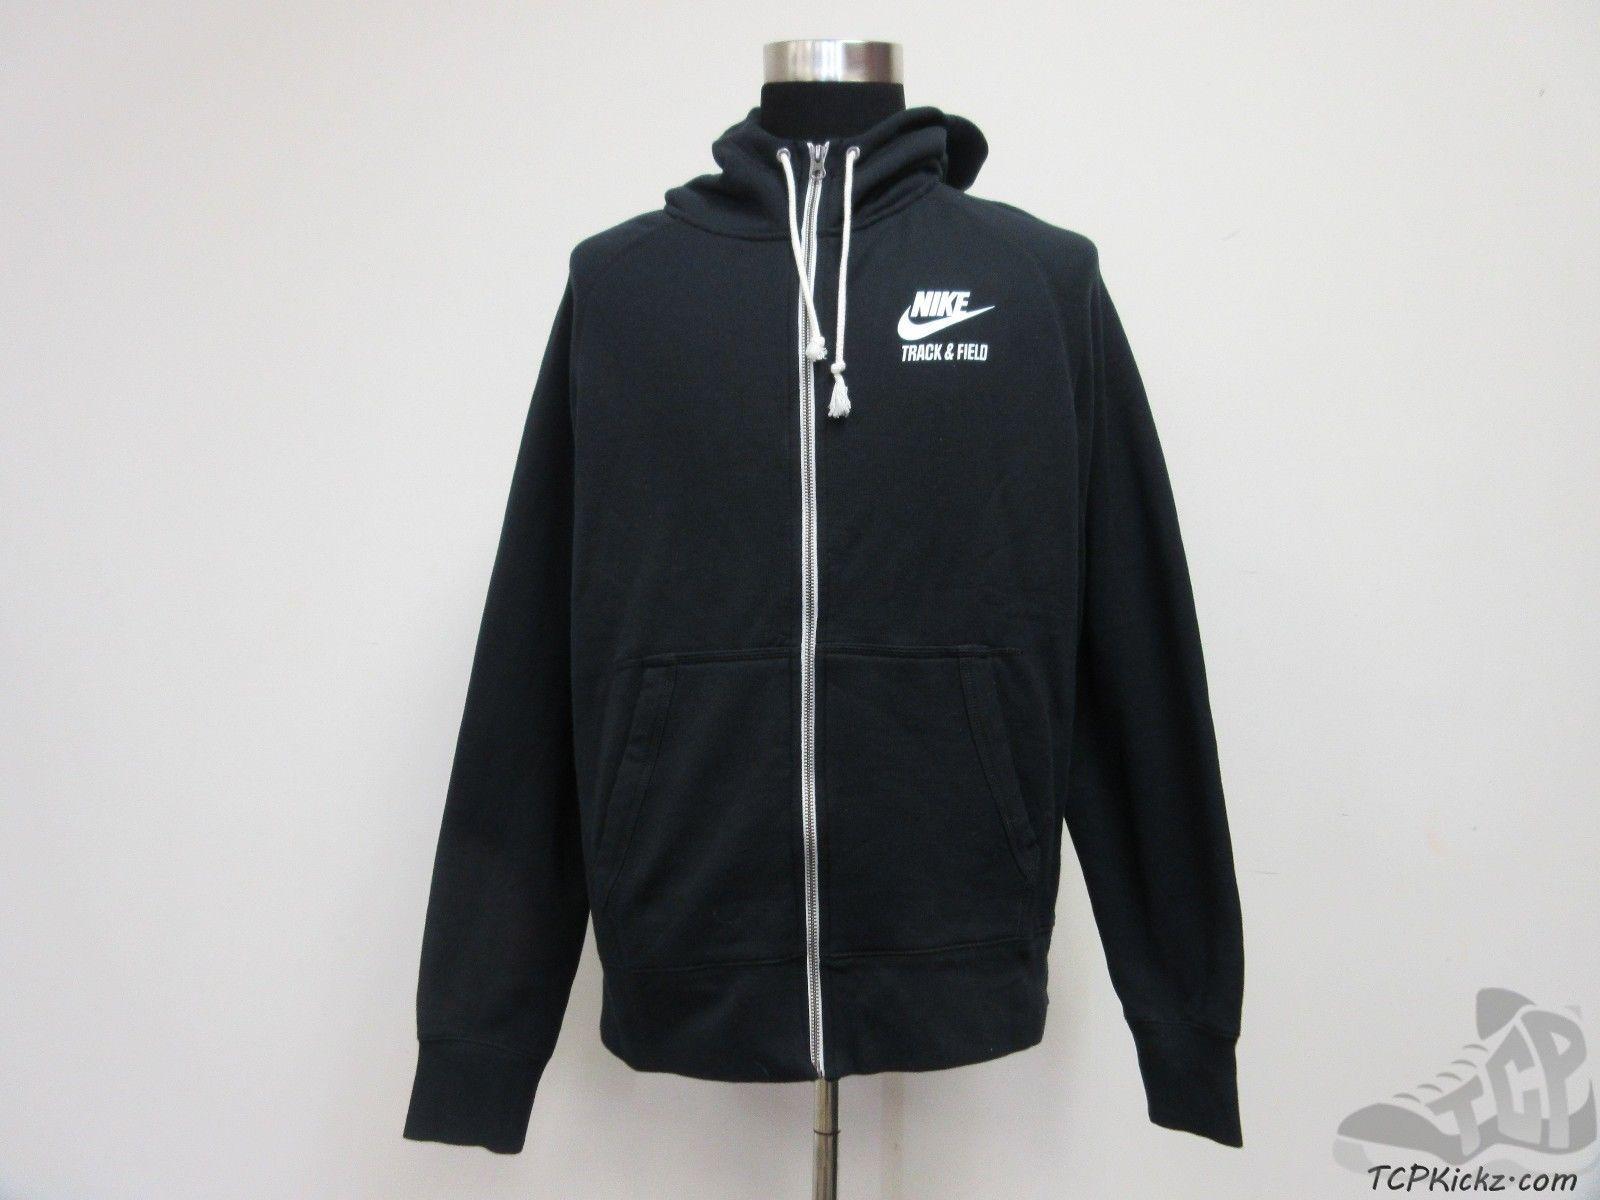 Men's Apparel : Nike USA Track & Field AW77 RU FZ Hoody